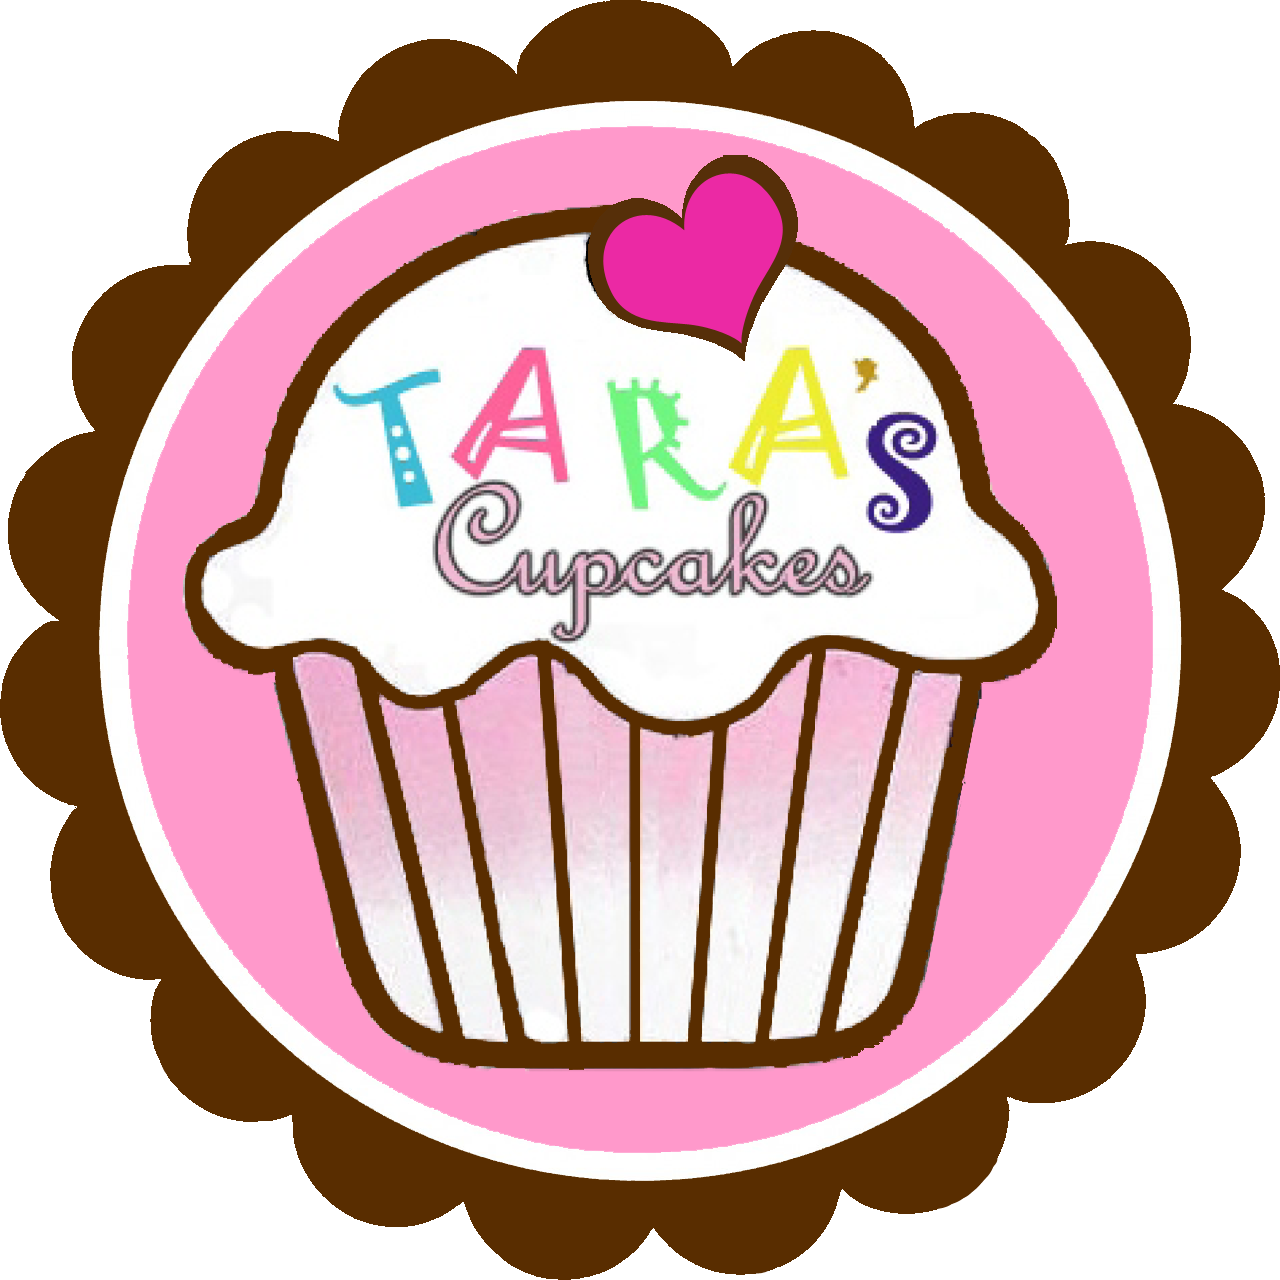 Cute Cupcake Logos Cute Cupcake Logo Png